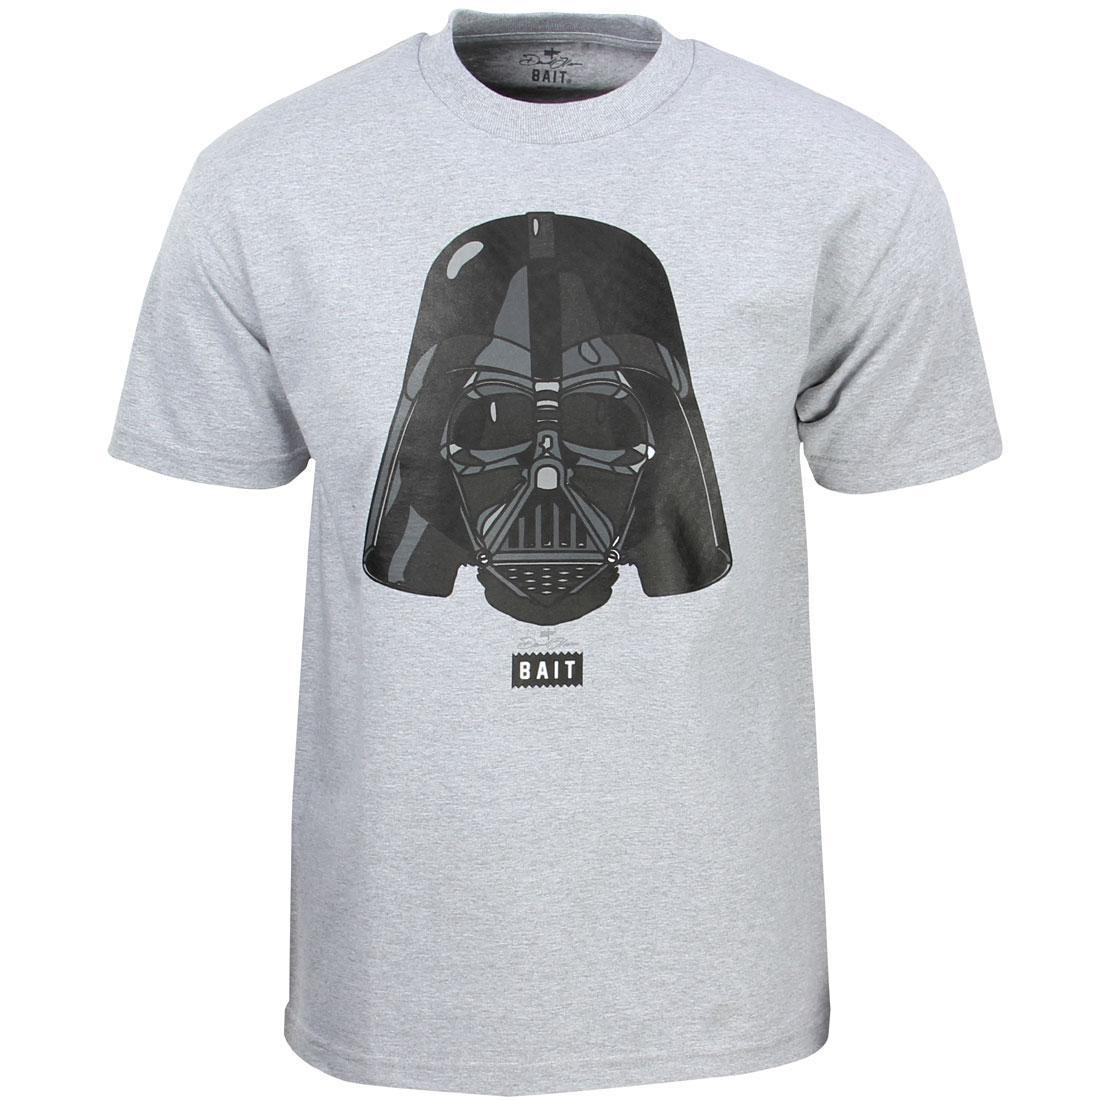 BAIT x David Flores Men Vader Tee (gray / heather)